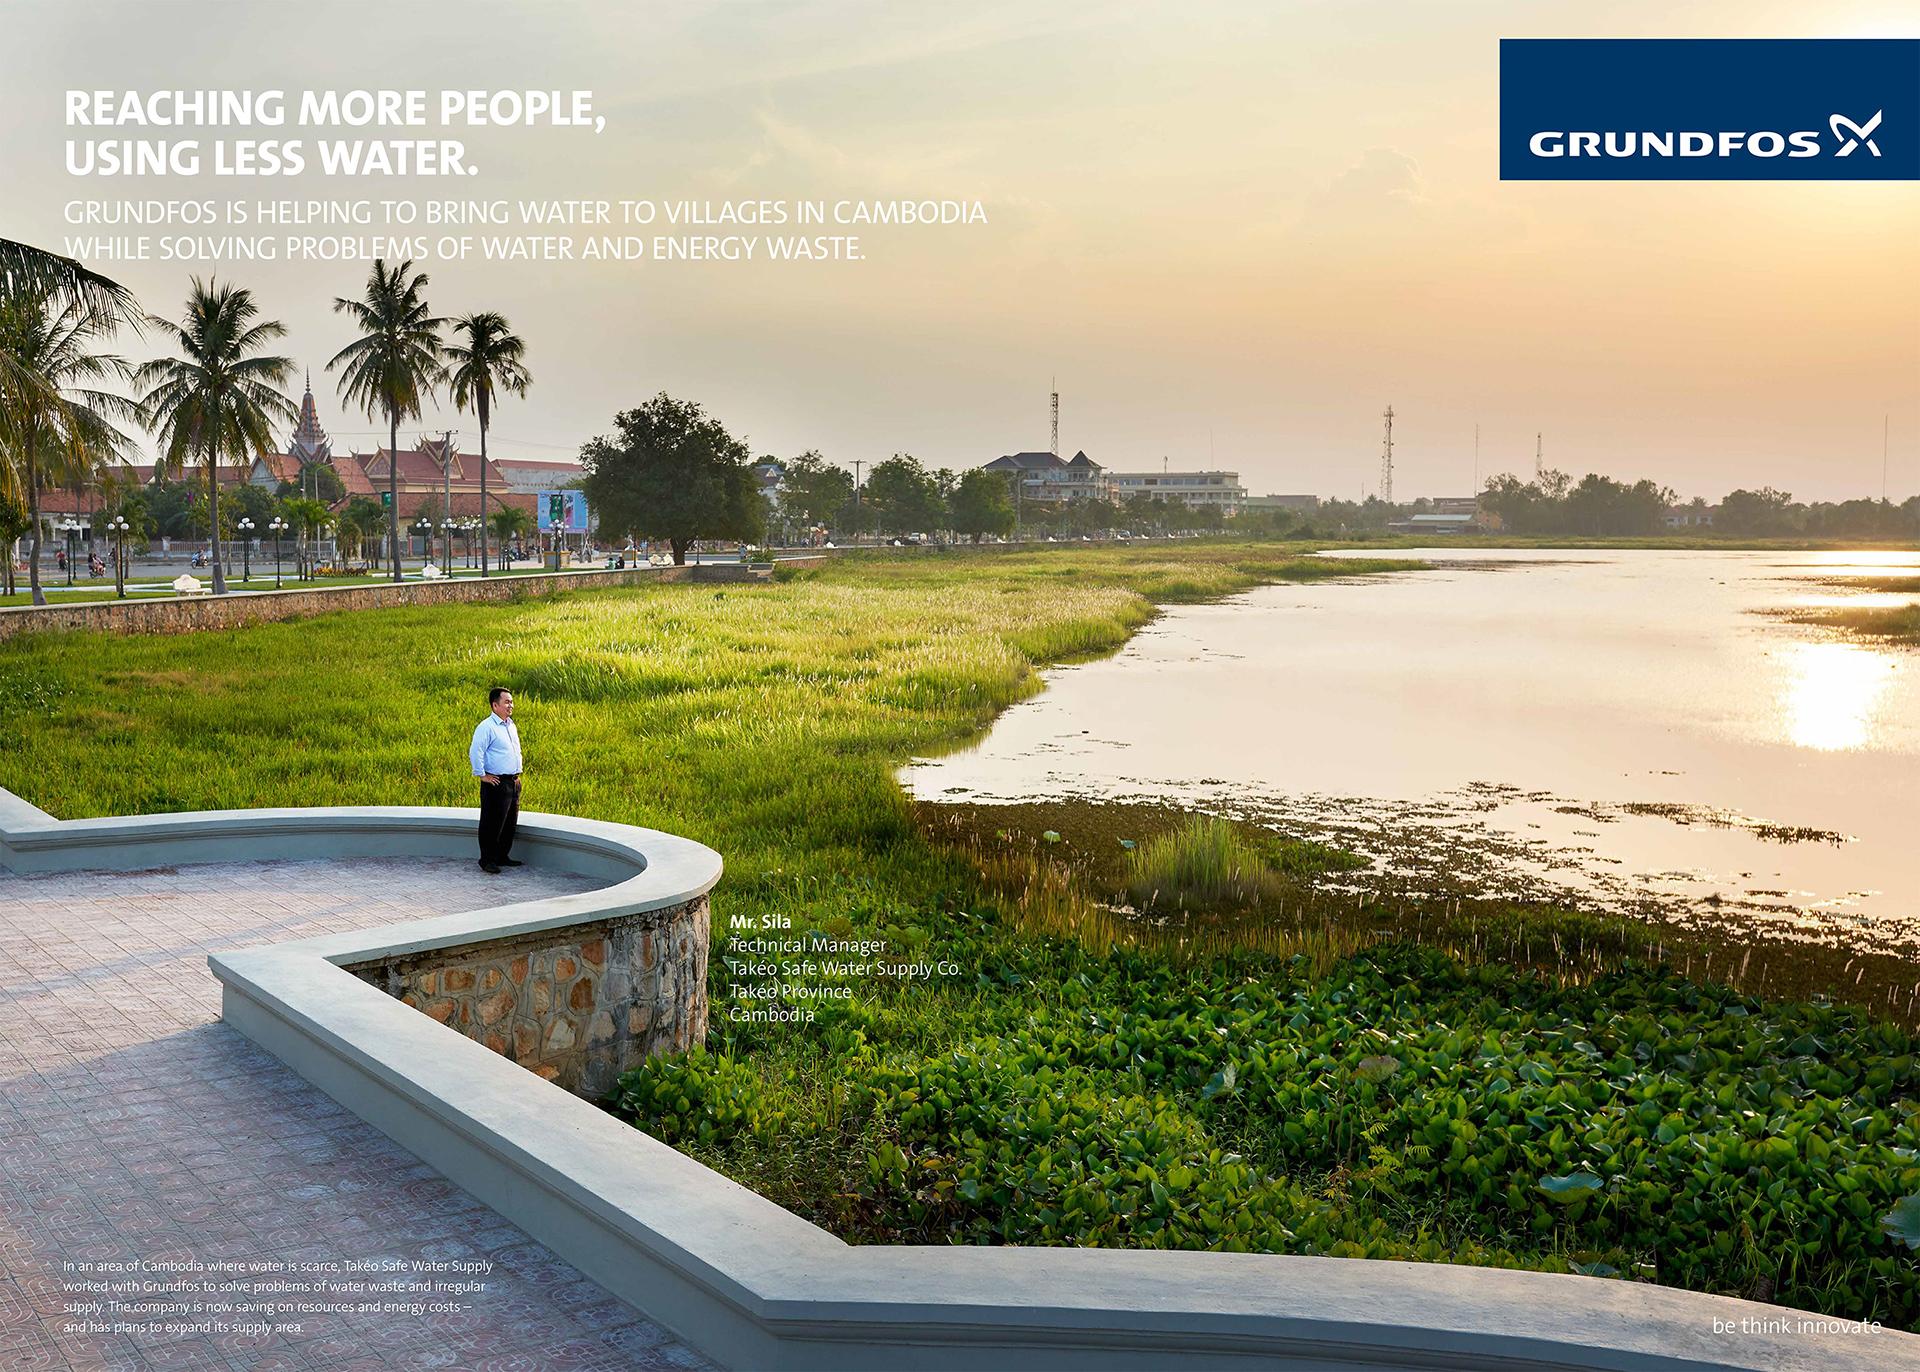 400255_BR_Grundfos-Stories_Cambodia_Society_1400mmw_1000mmh_ART2_XHI